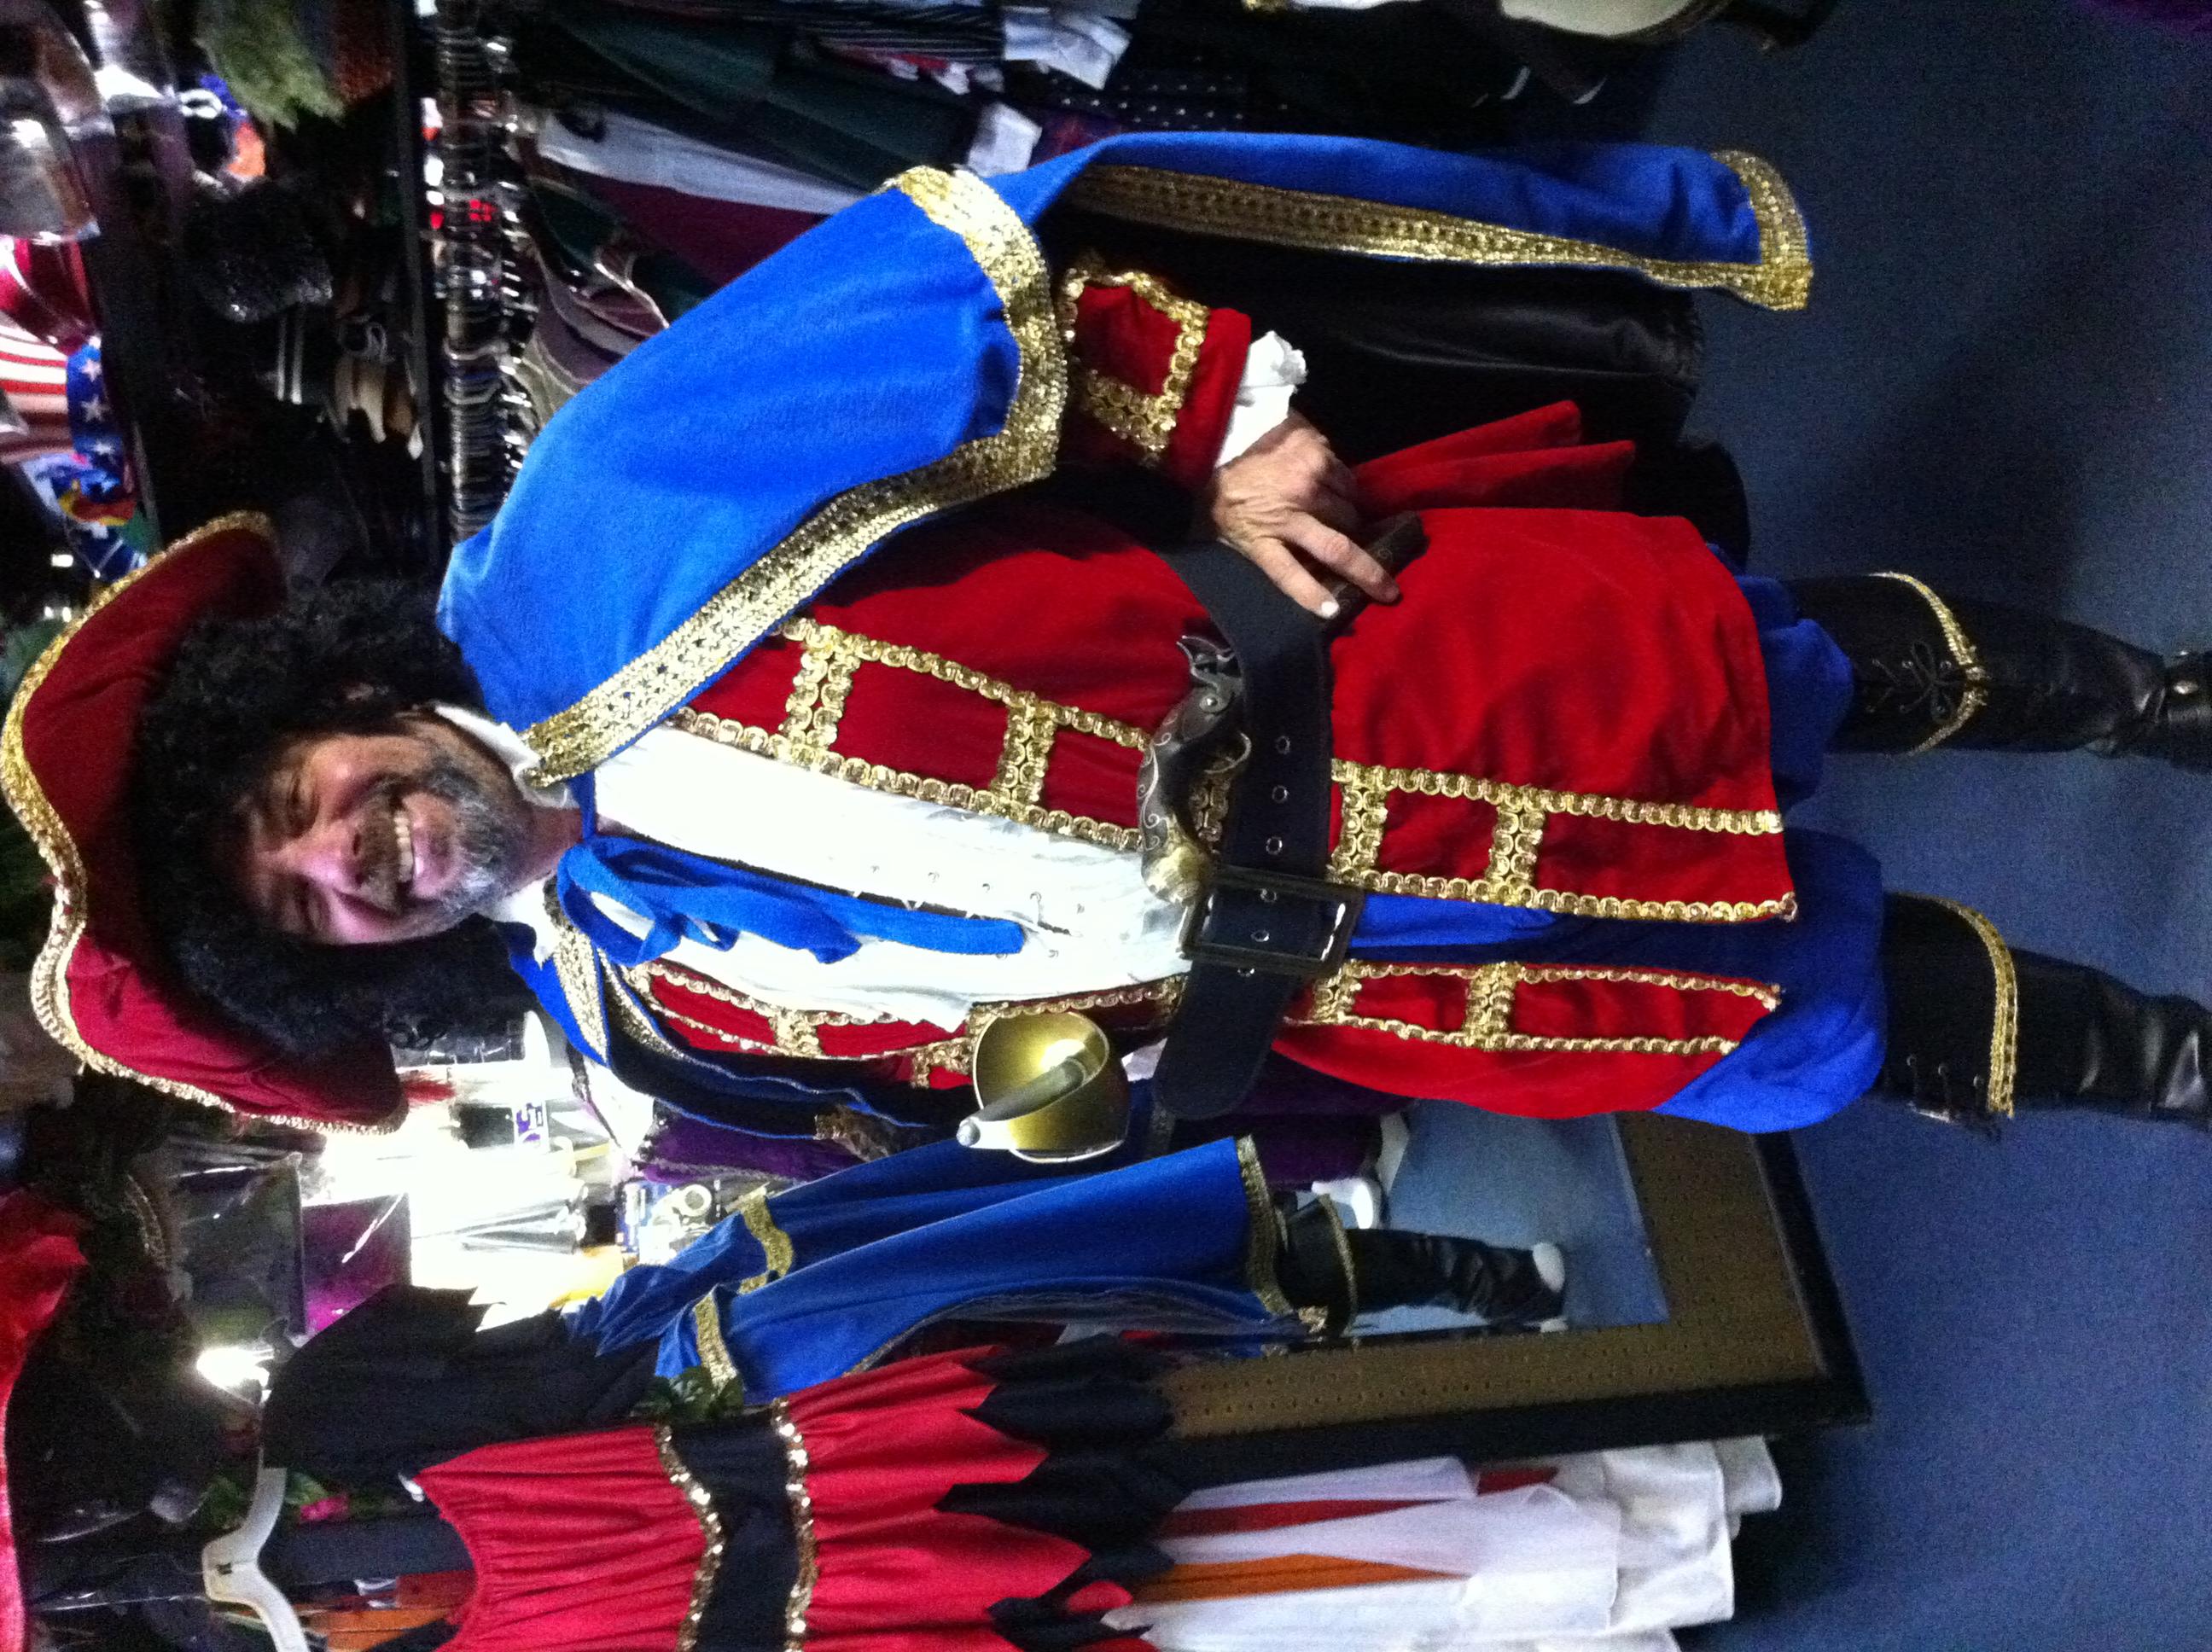 arlenes costume shop toms river nj 08753 ypcom - Halloween Stores In Toms River Nj